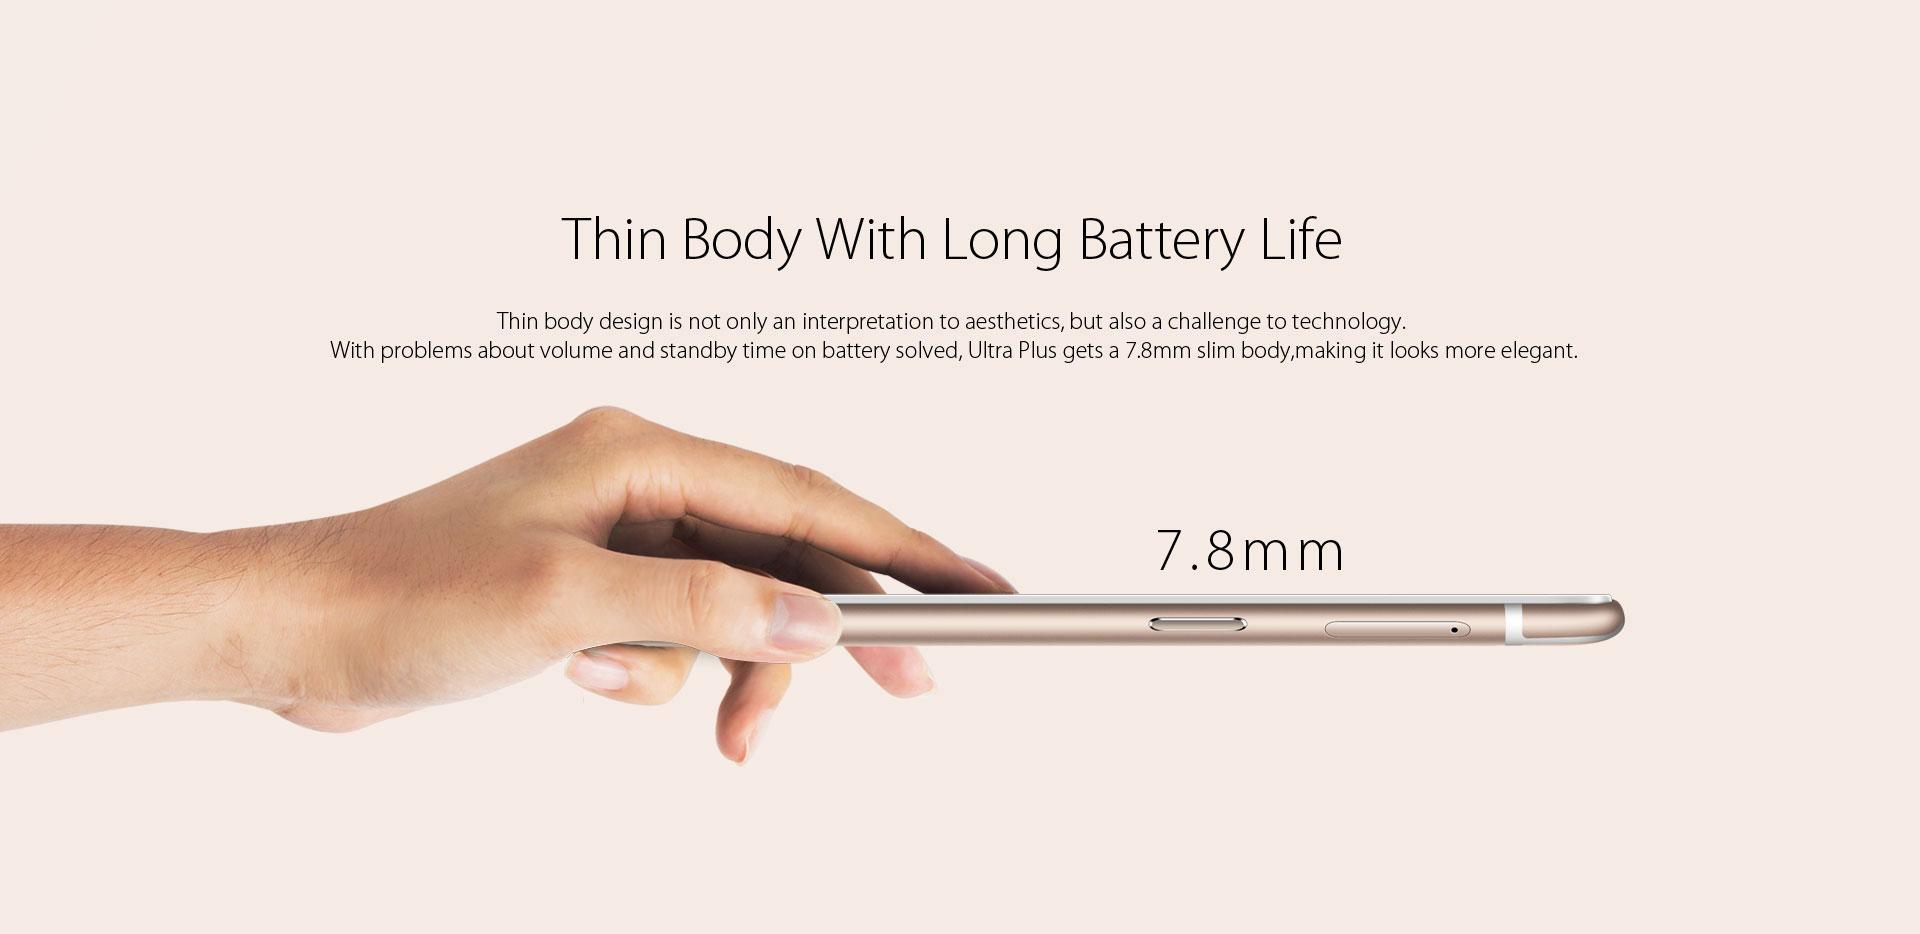 Blackview Ultra Plus, China Preissuchmaschine, Preisvergleich Cina Smartphone, Chinahandy, Sonderangebot, Aktion